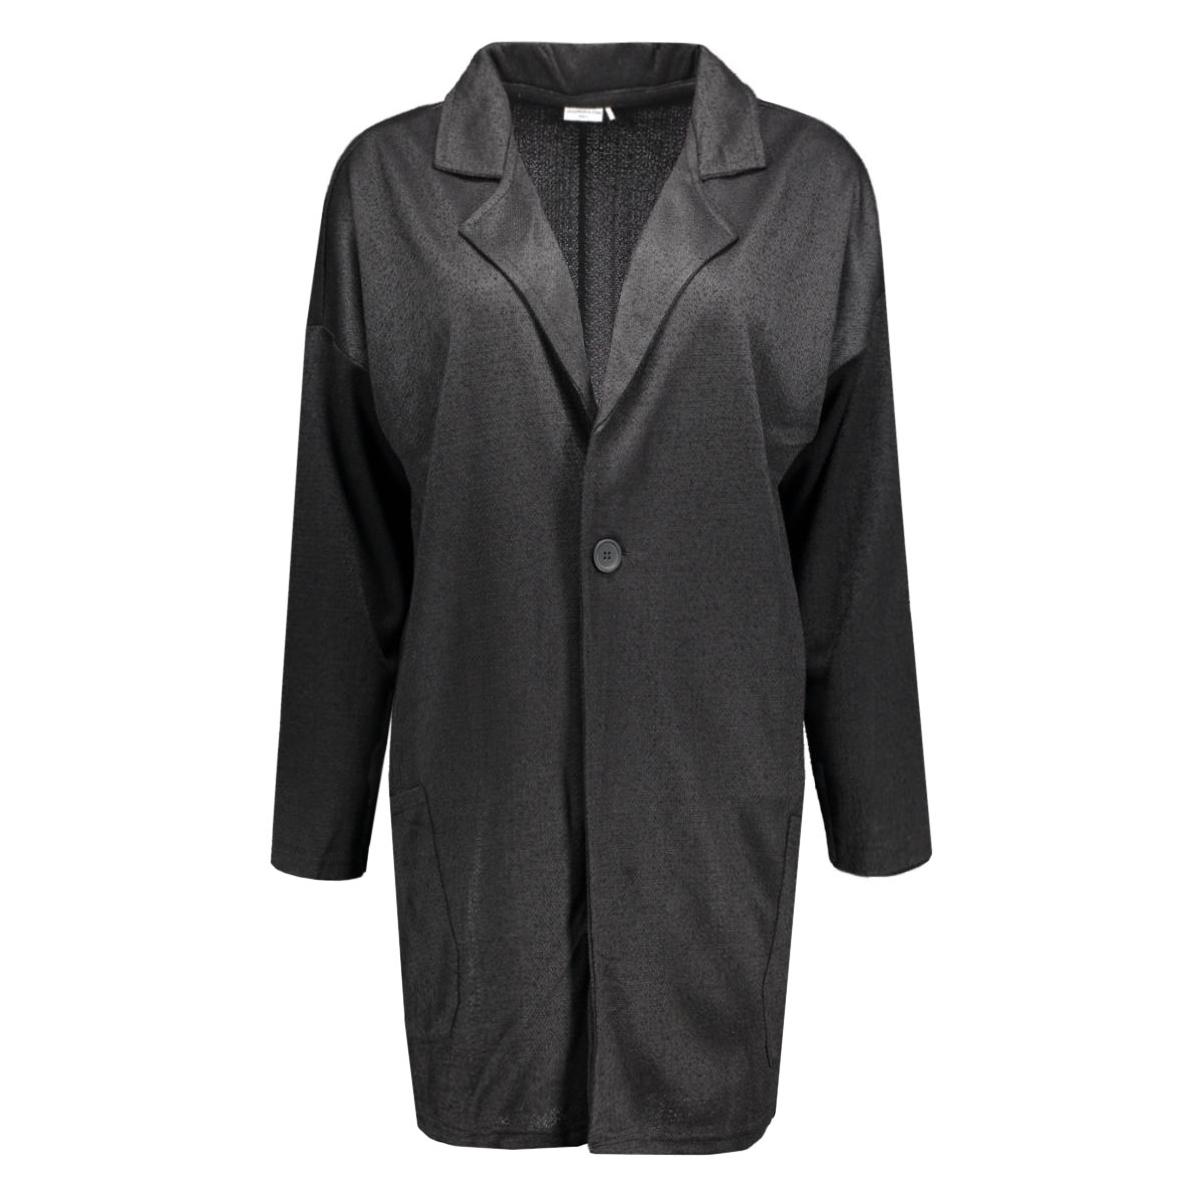 jdyteller l/s cardigan swt 15117187 jacqueline de yong blazer black